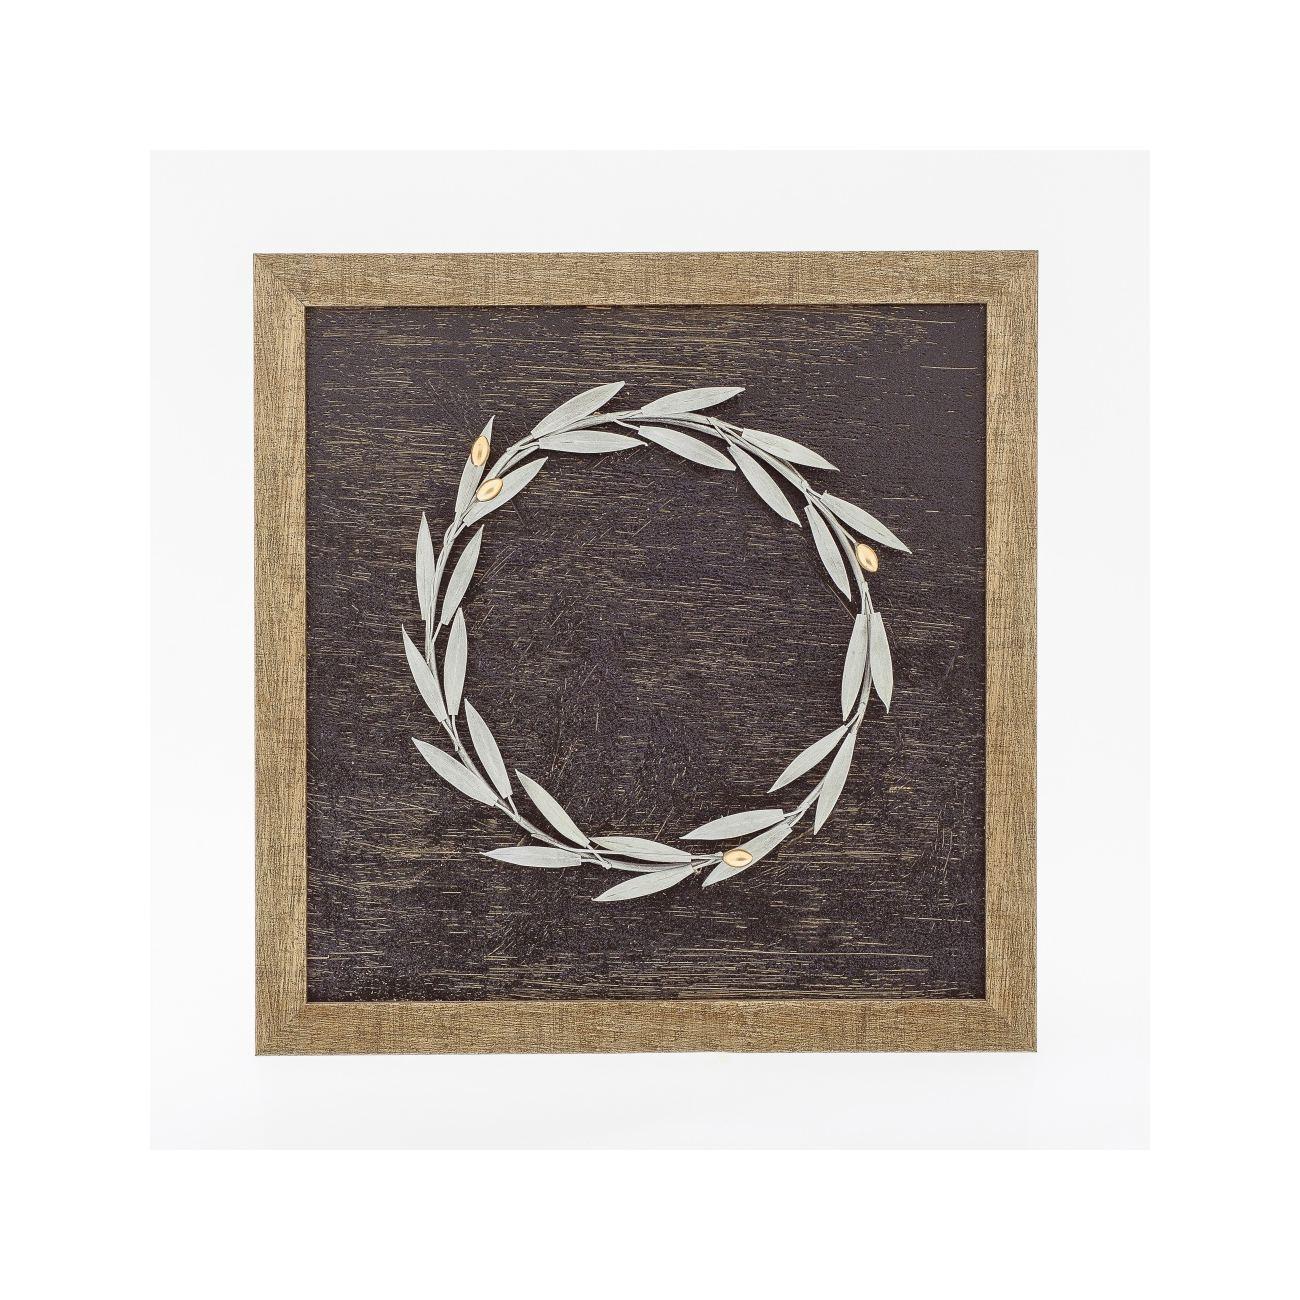 Olive Wreath 3D - Wood & Metal Handmade Wall Framed Artwork - 13 4